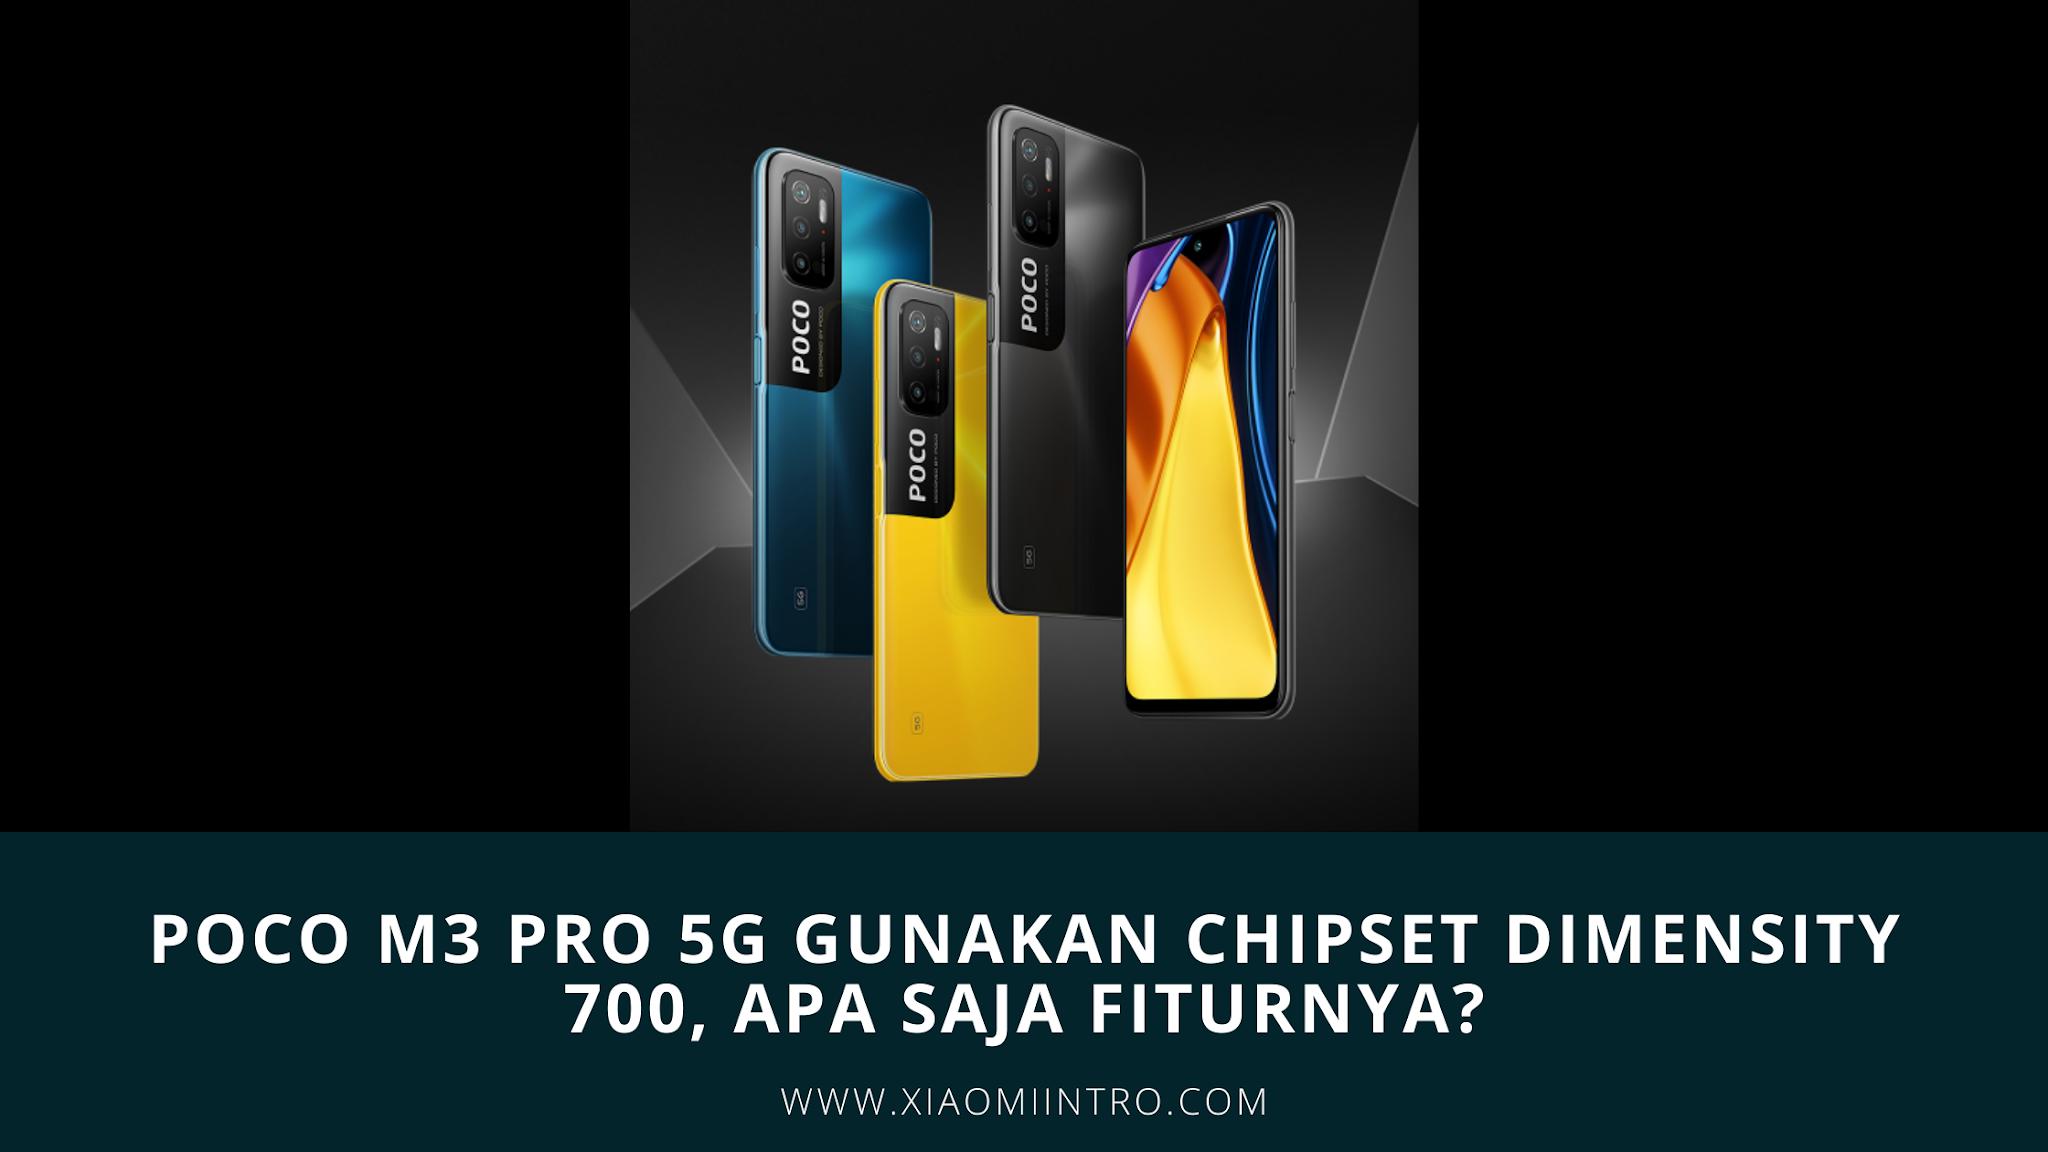 Poco M3 Pro 5G Gunakan Chipset Dimensity 700, Apa Saja Fiturnya?